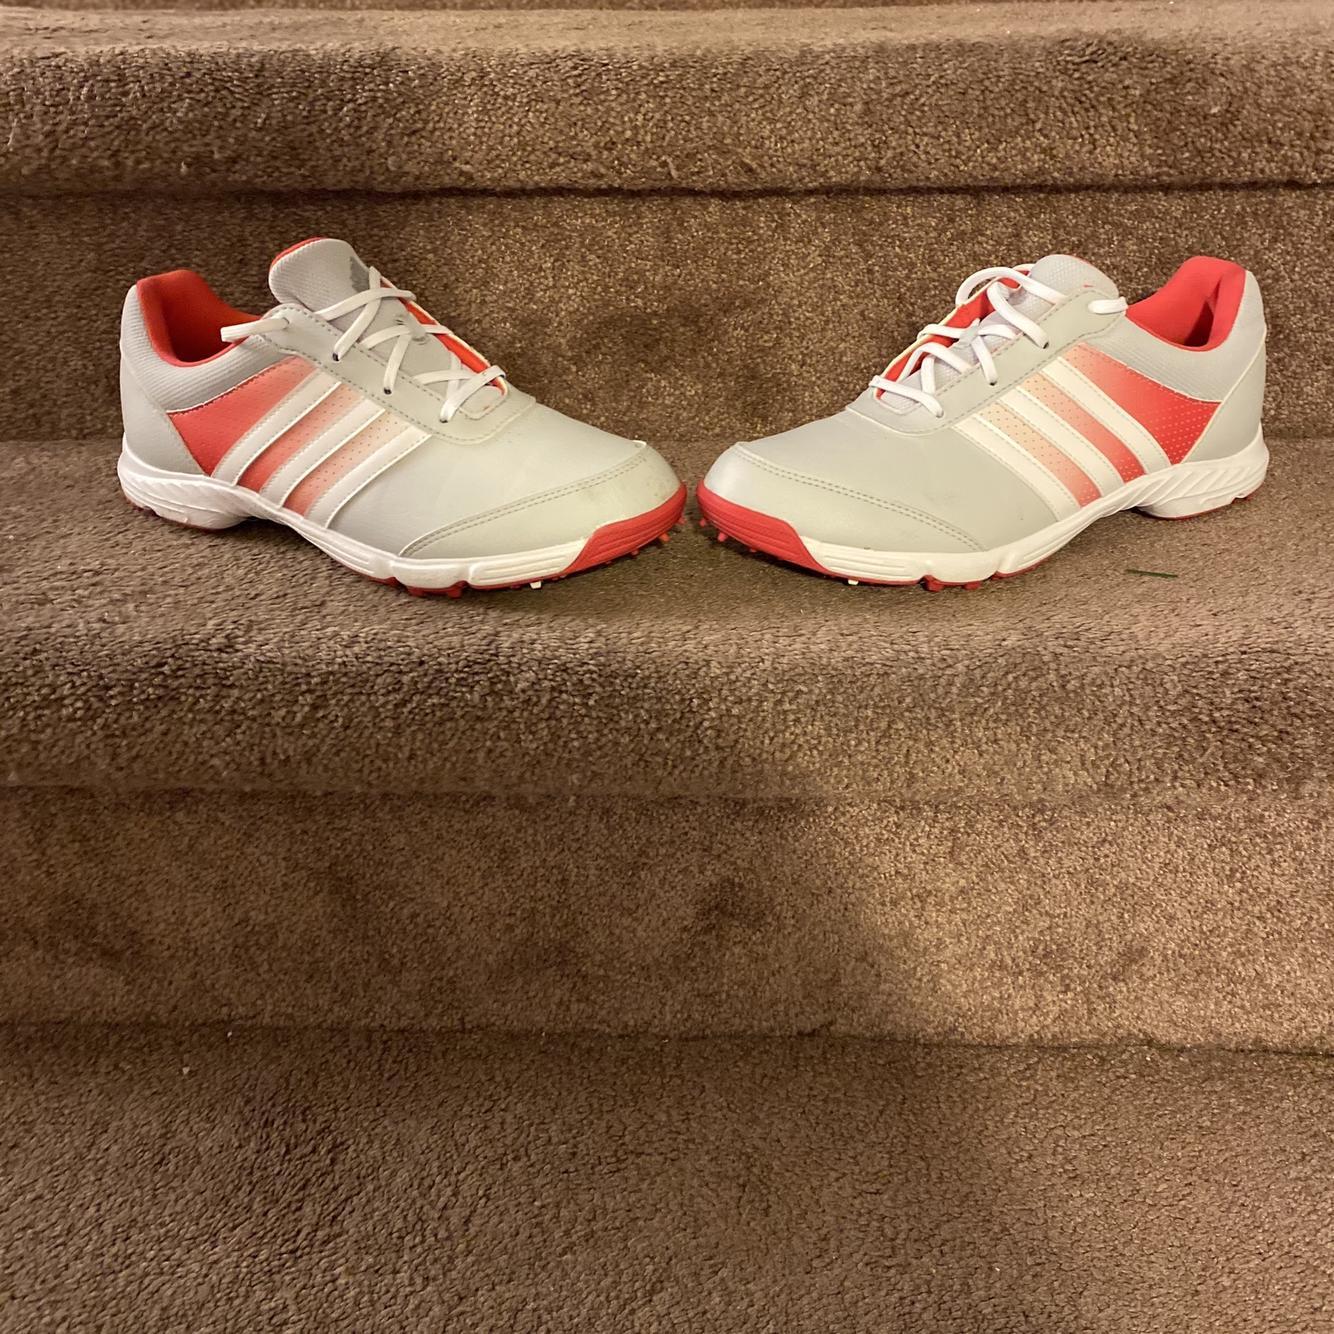 Women's Size 7.5 (Women's 8.5) Adidas Golf Shoes | SidelineSwap